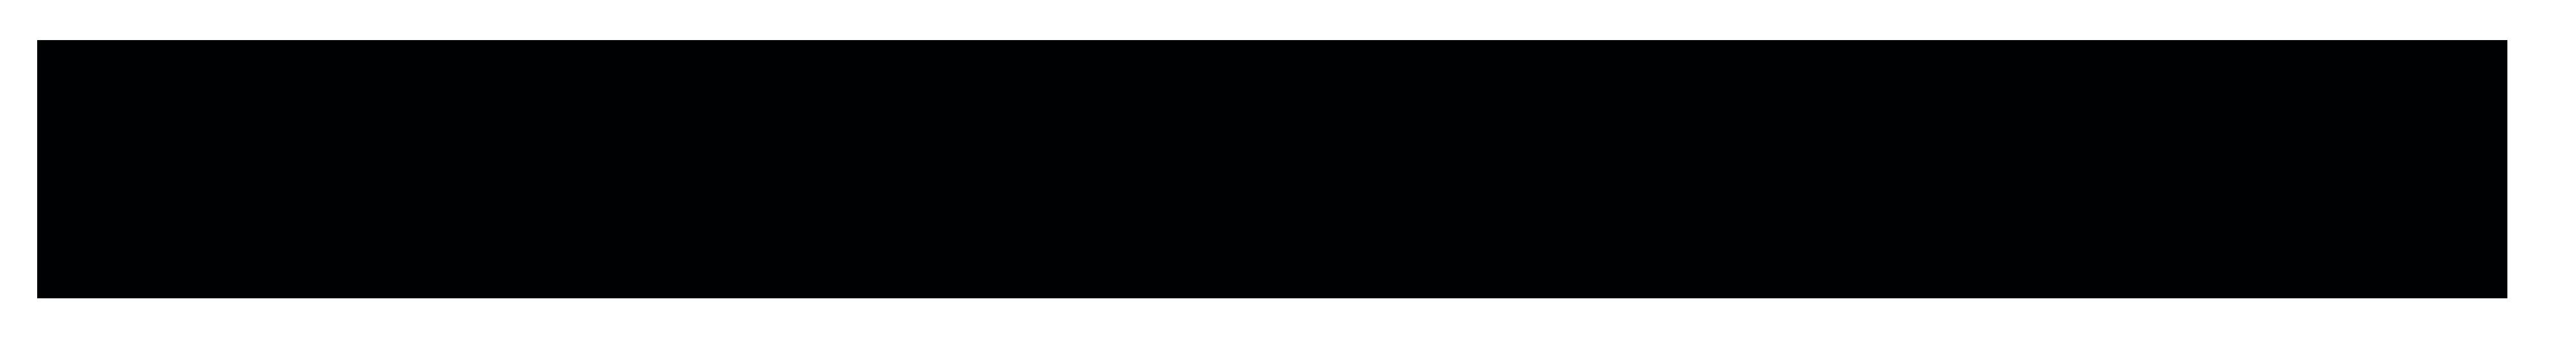 EC_logo_black_L